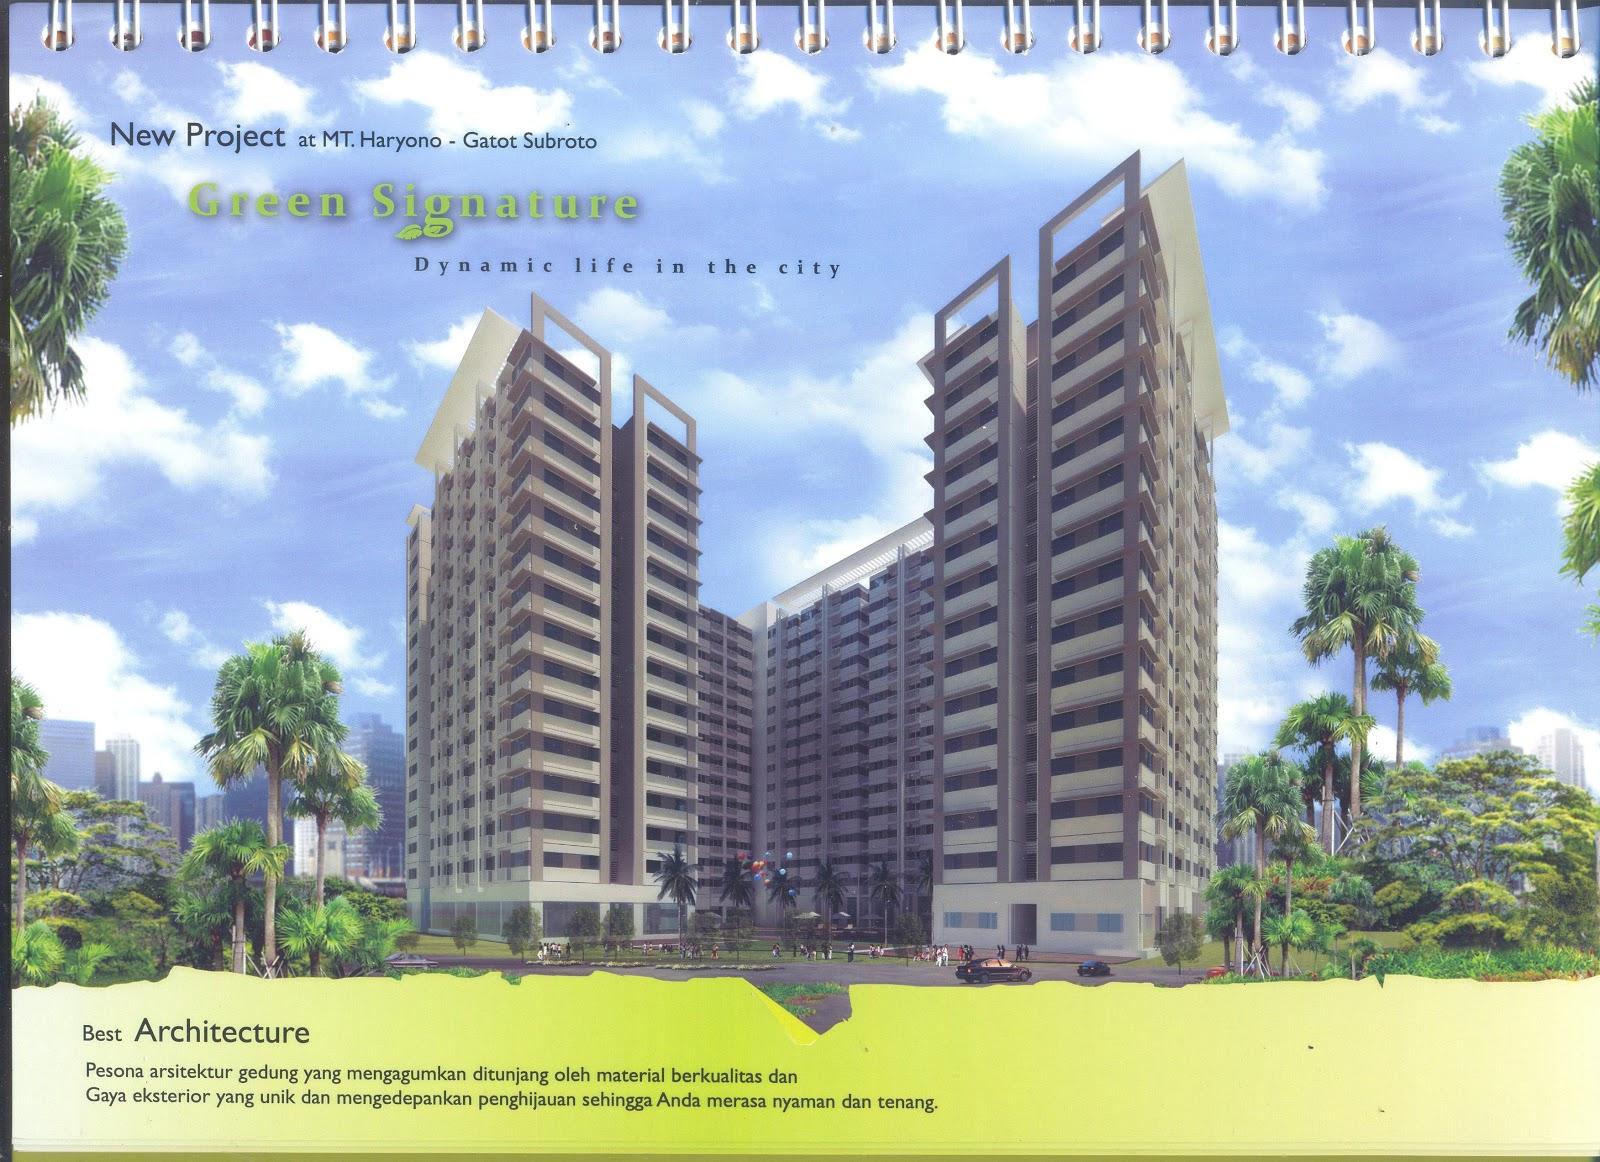 Apartemen Green Signature Jl Mt Haryono Kav 20 Jakarta